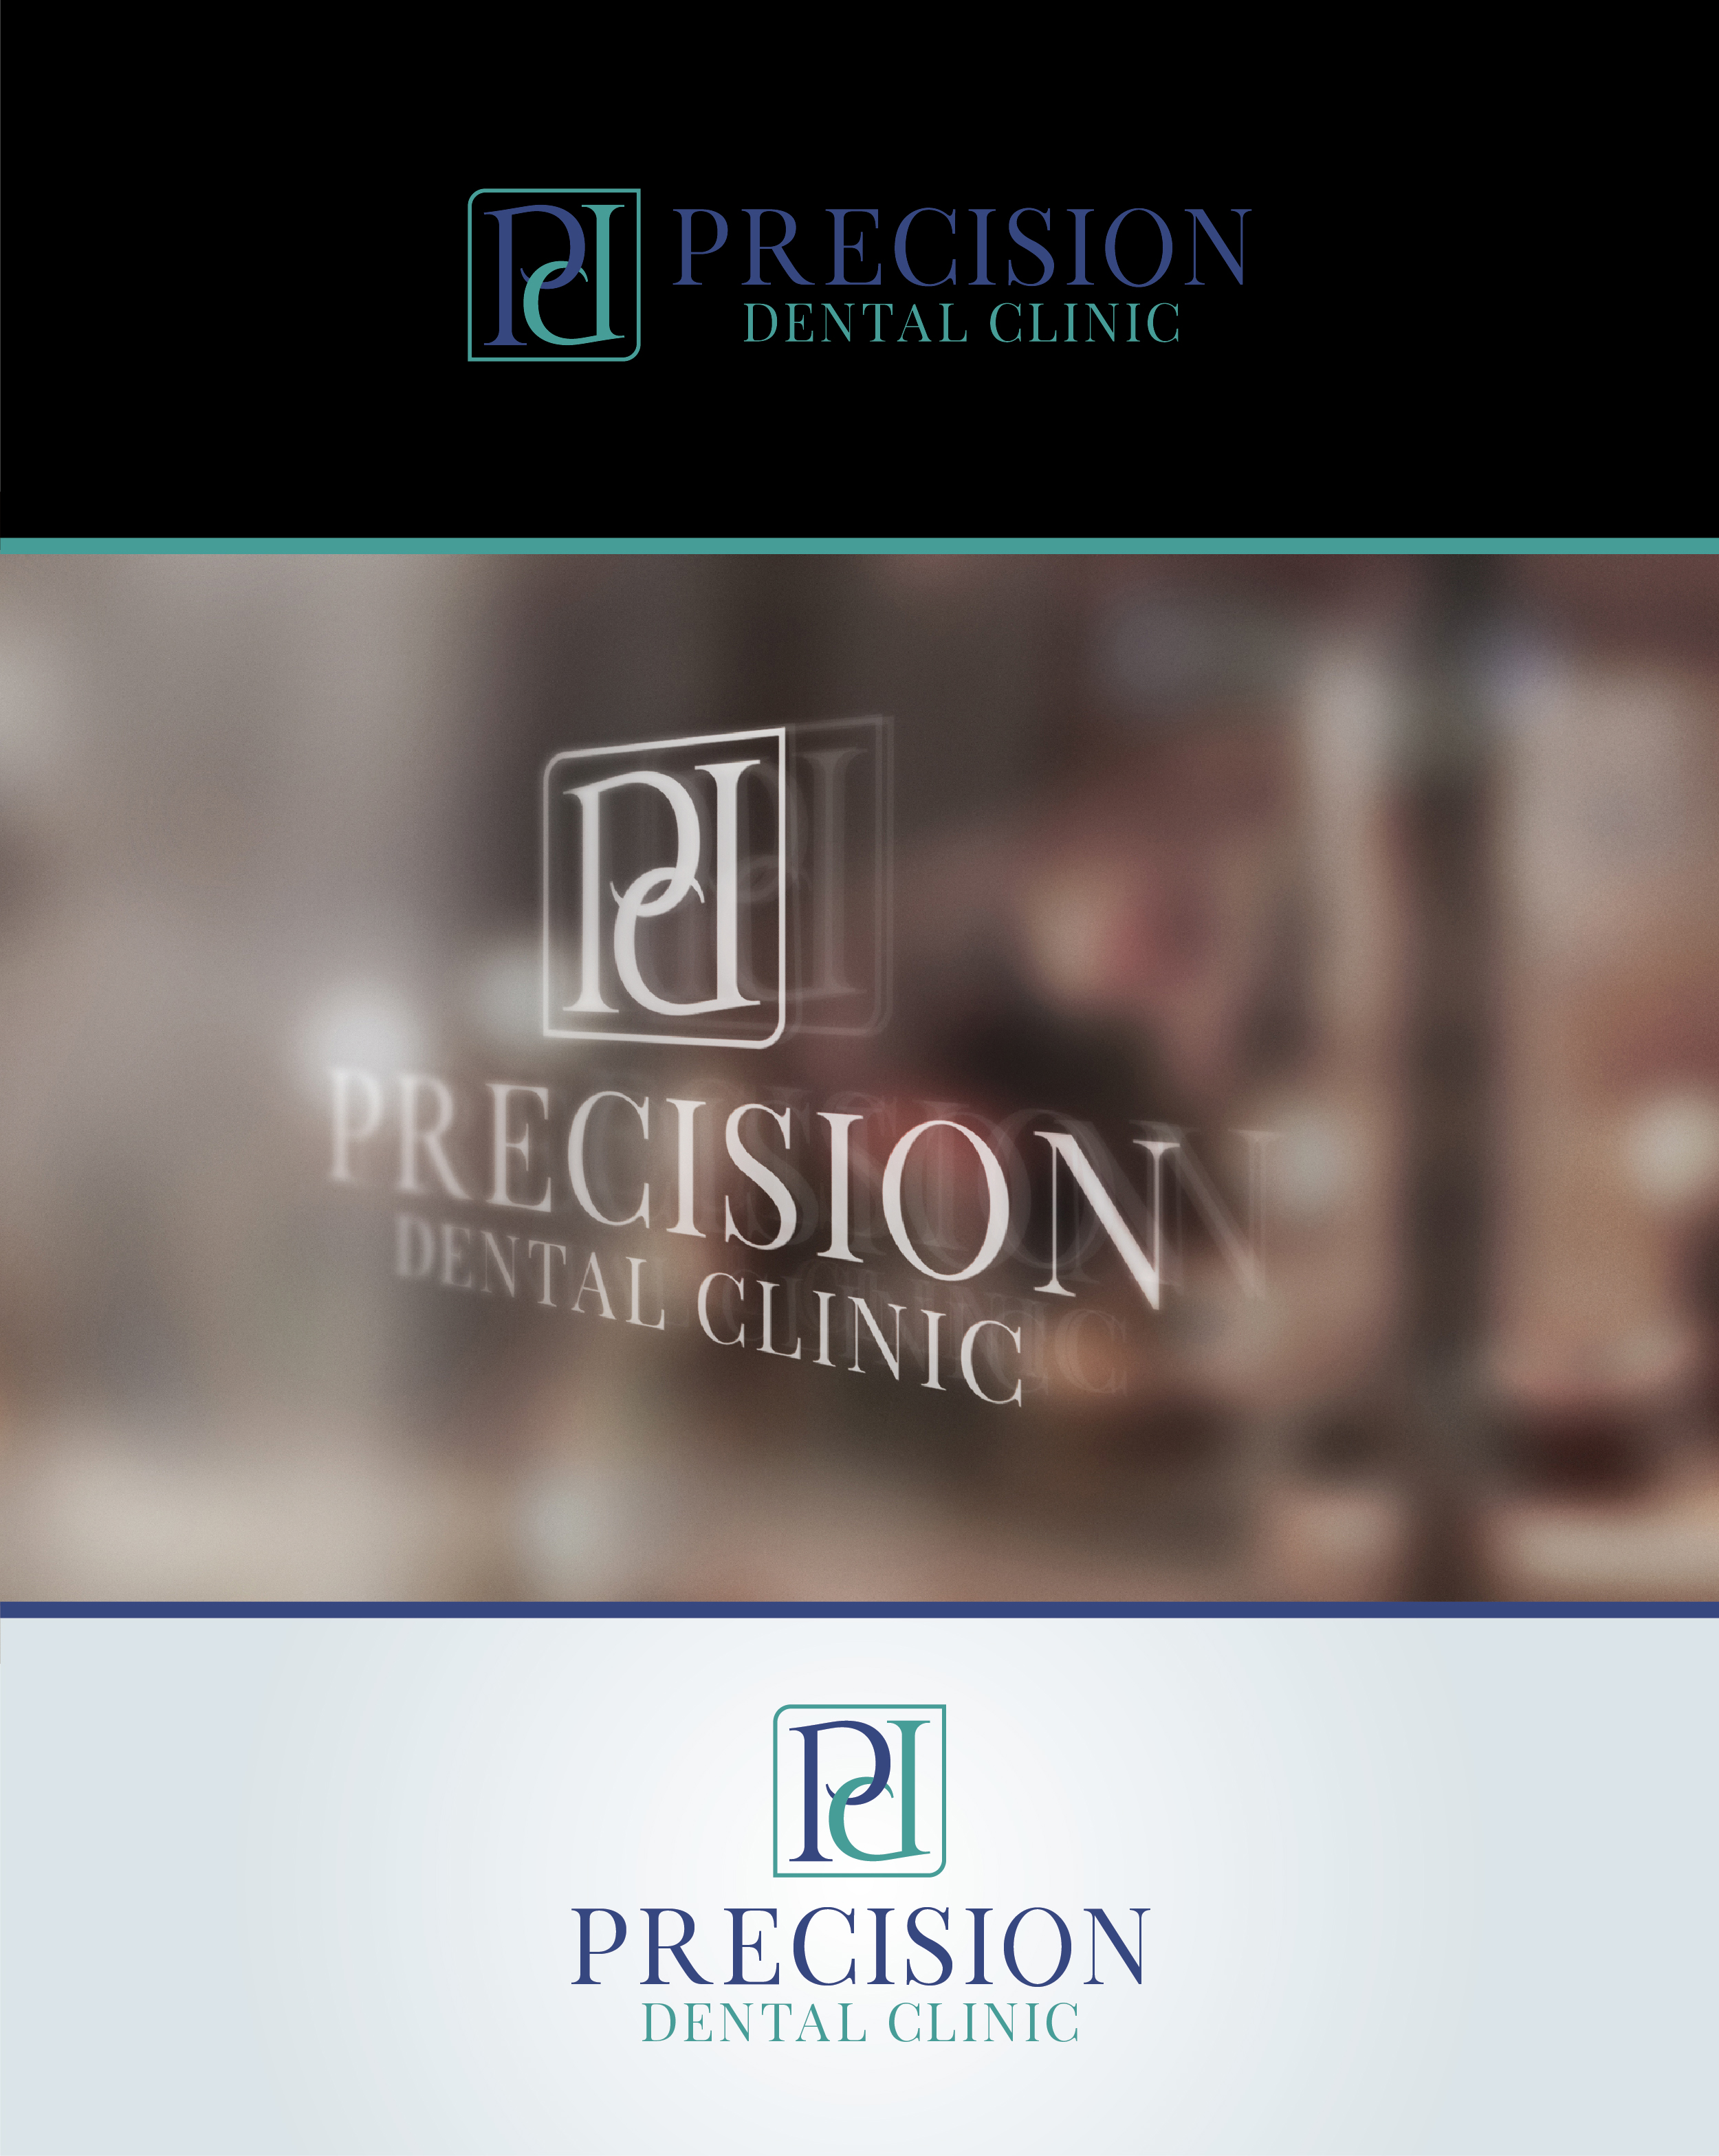 Logo Design by Shahab Uddin - Entry No. 80 in the Logo Design Contest Captivating Logo Design for Precision Dental Clinic.